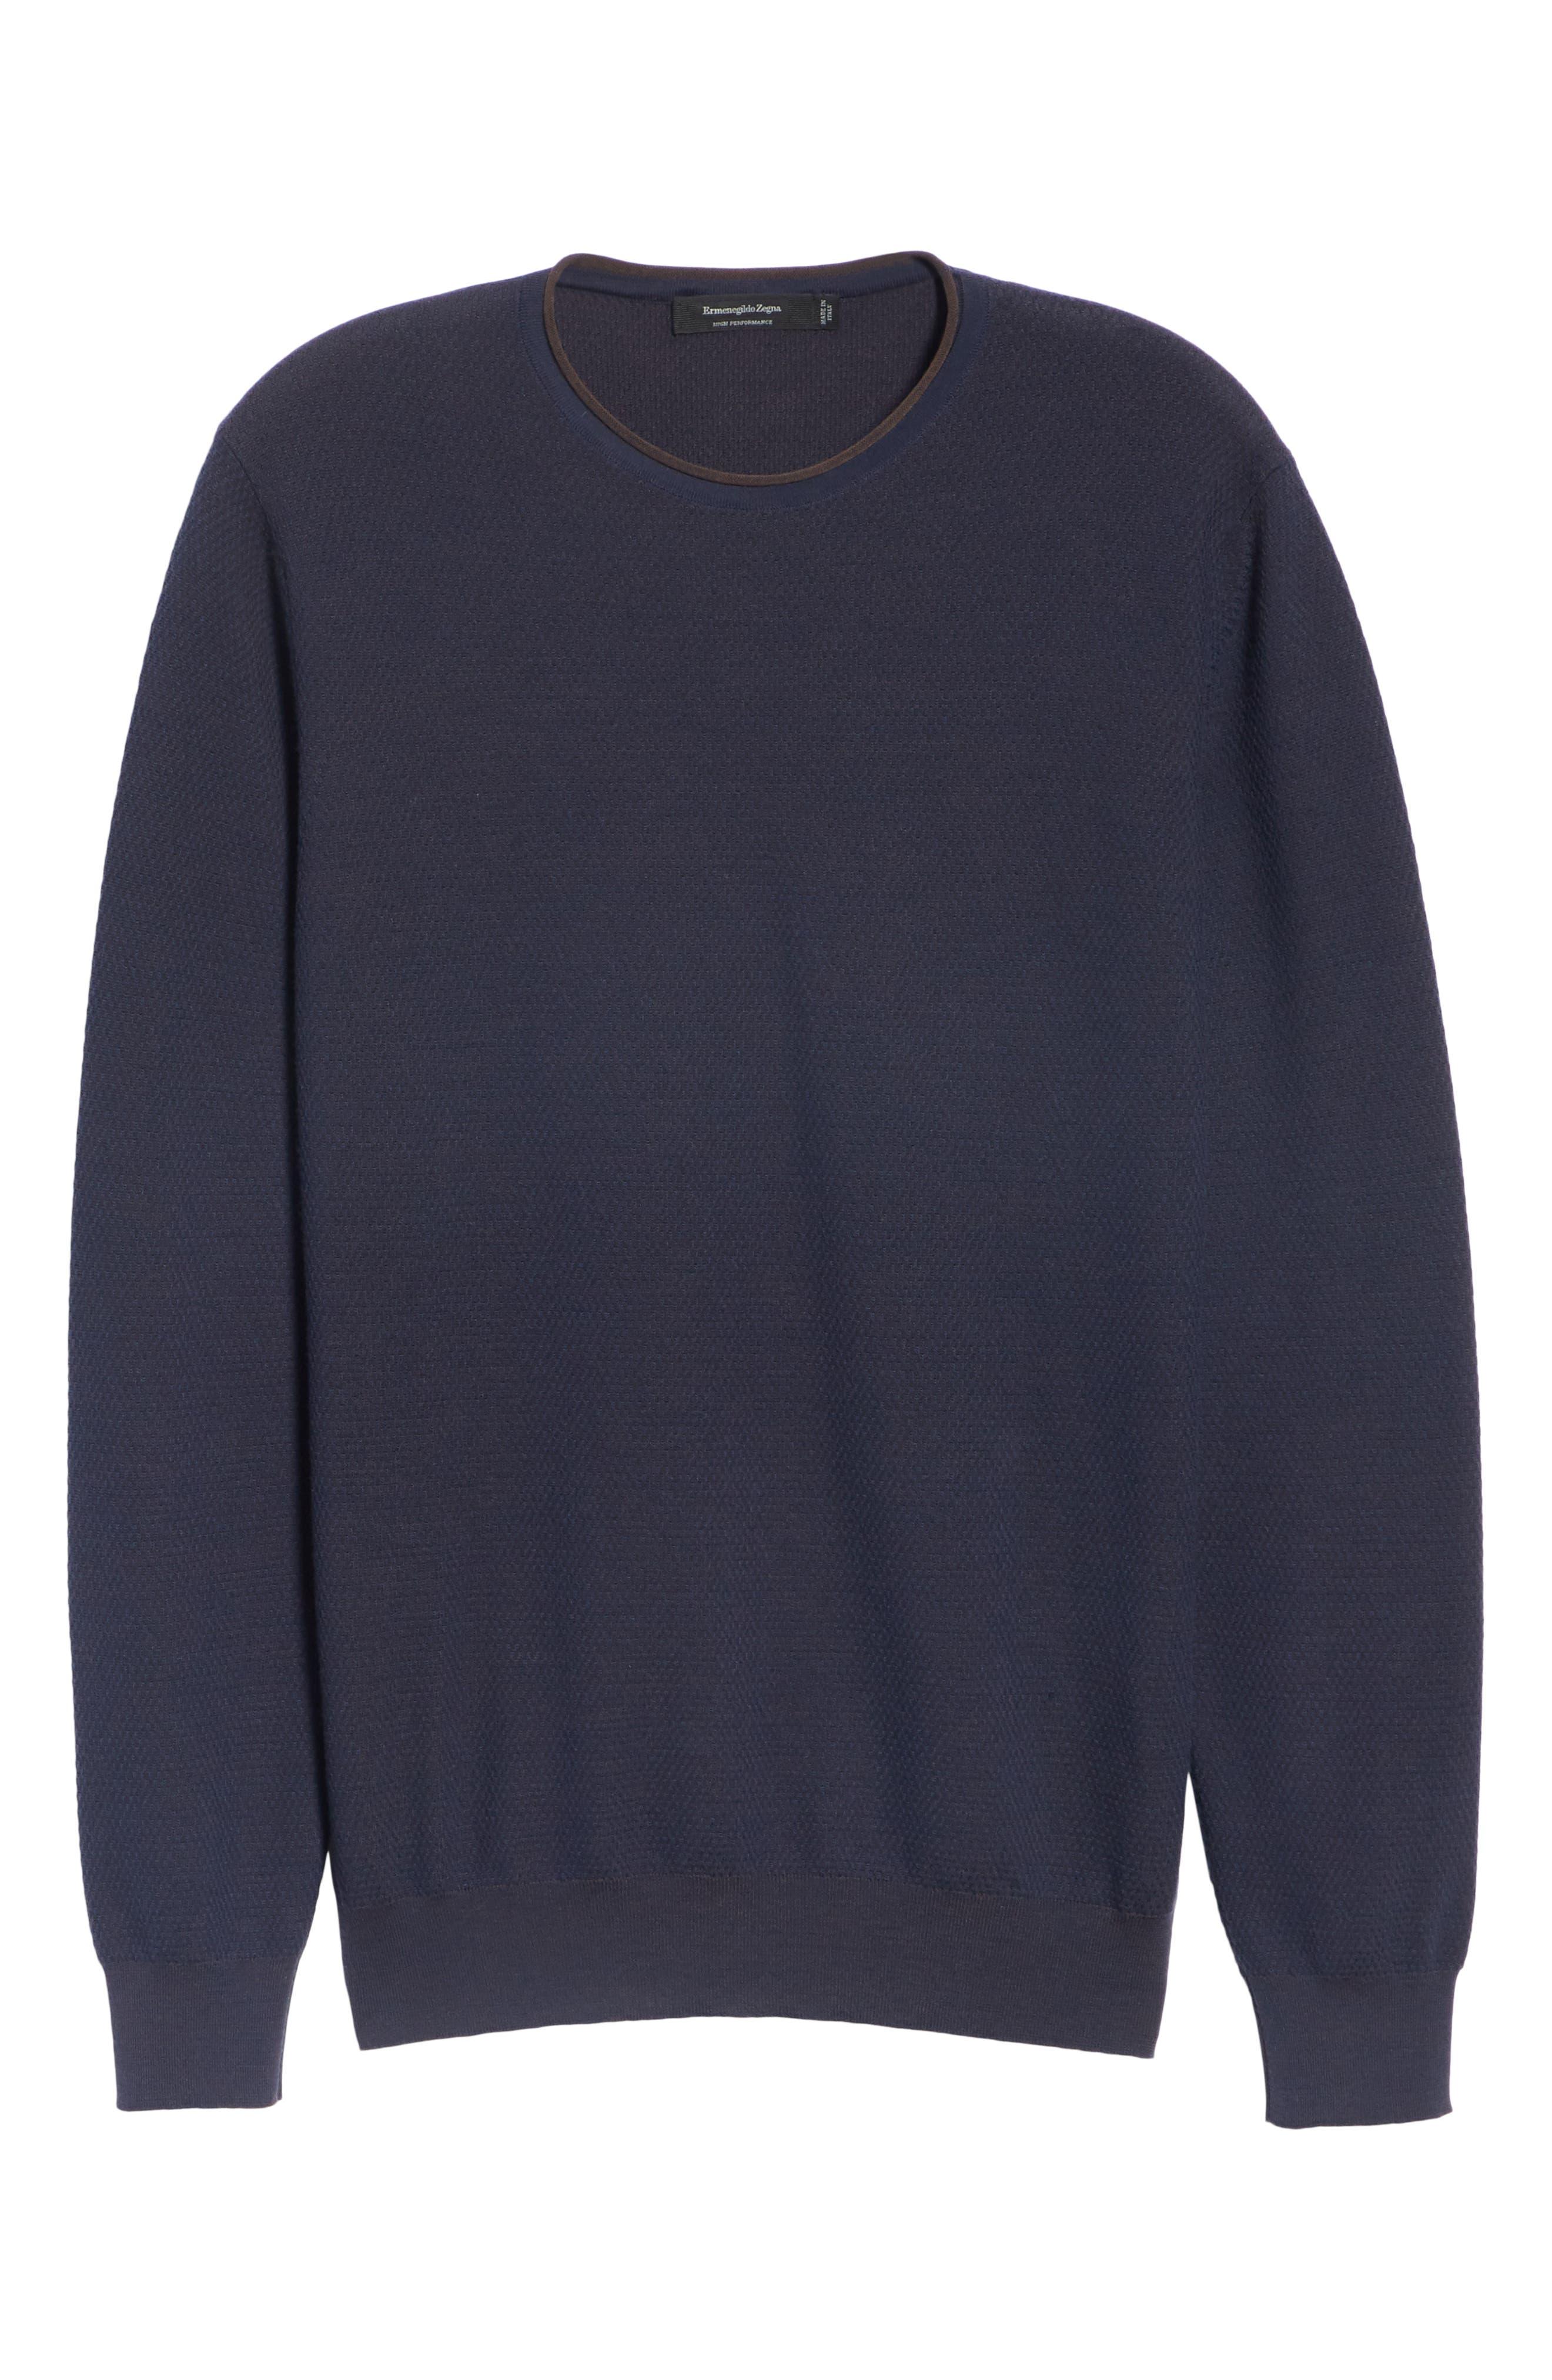 Crewneck Wool Sweater,                             Alternate thumbnail 6, color,                             NAVY